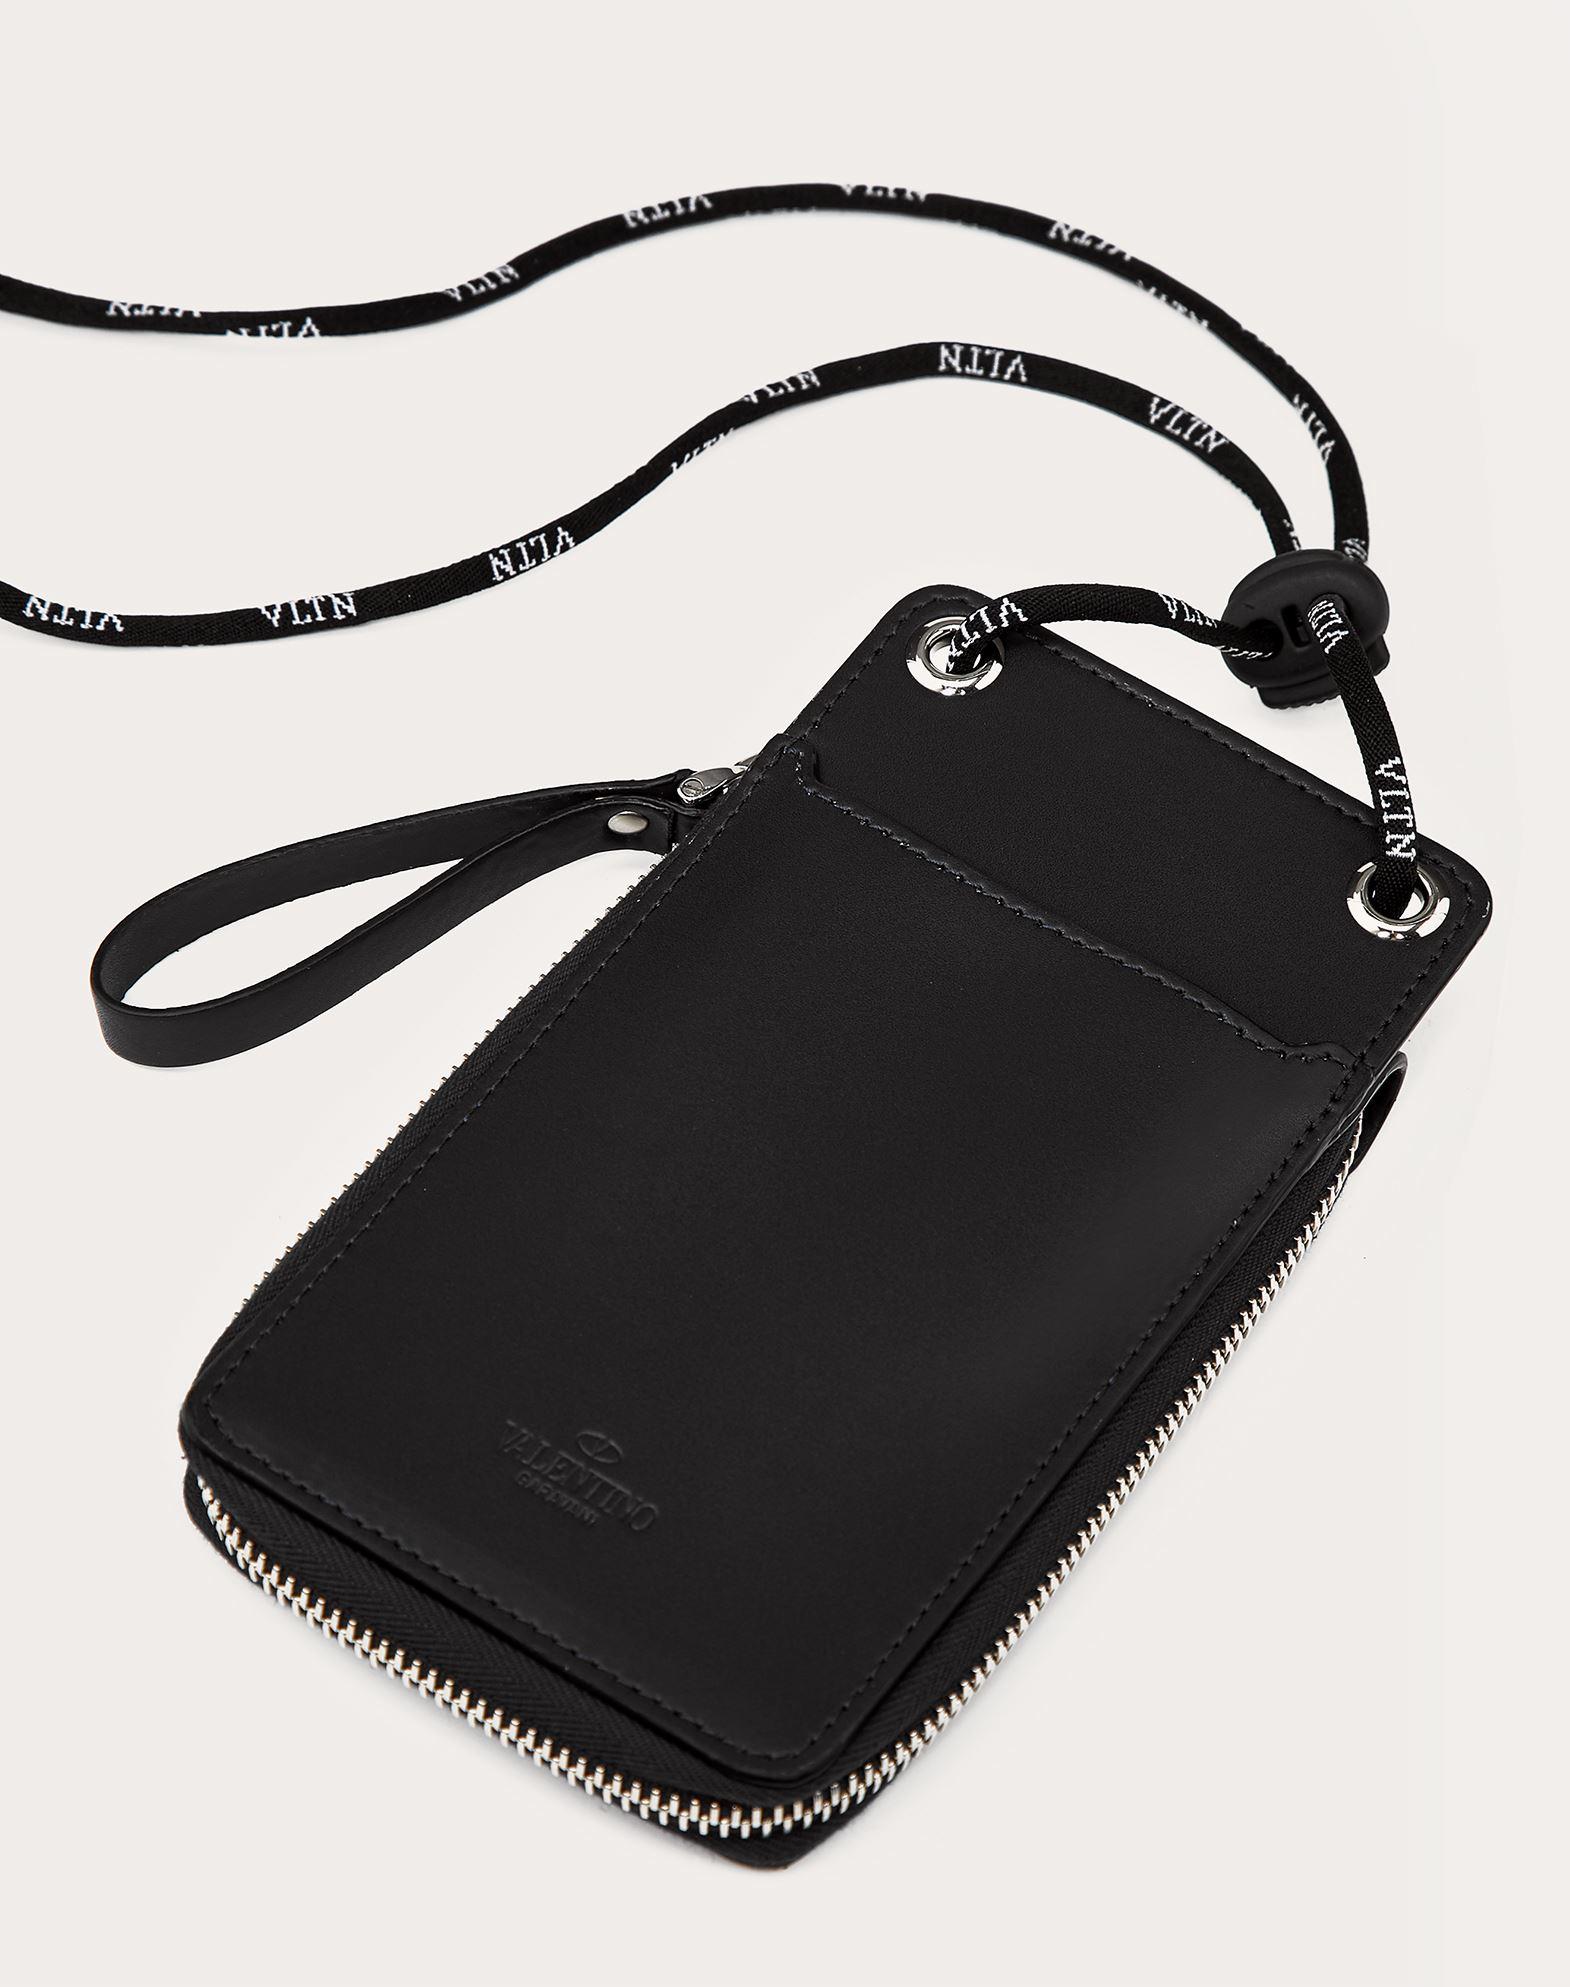 VALENTINO GARAVANI UOMO VLTN neck wallet  COIN PURSES & CARD CASES U d